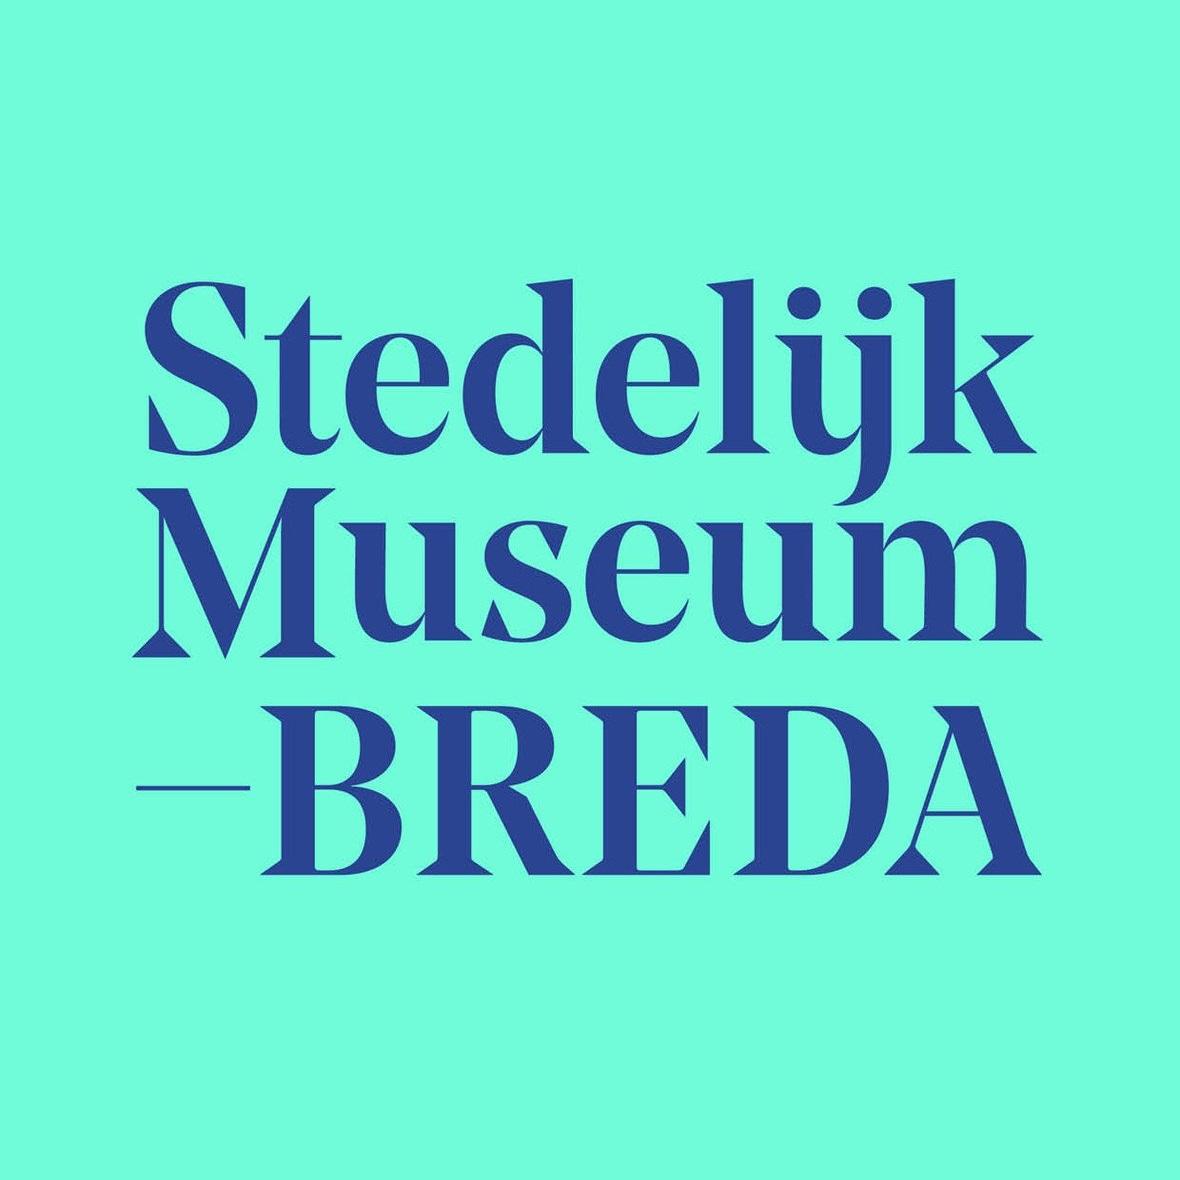 Stedelijke museum Breda